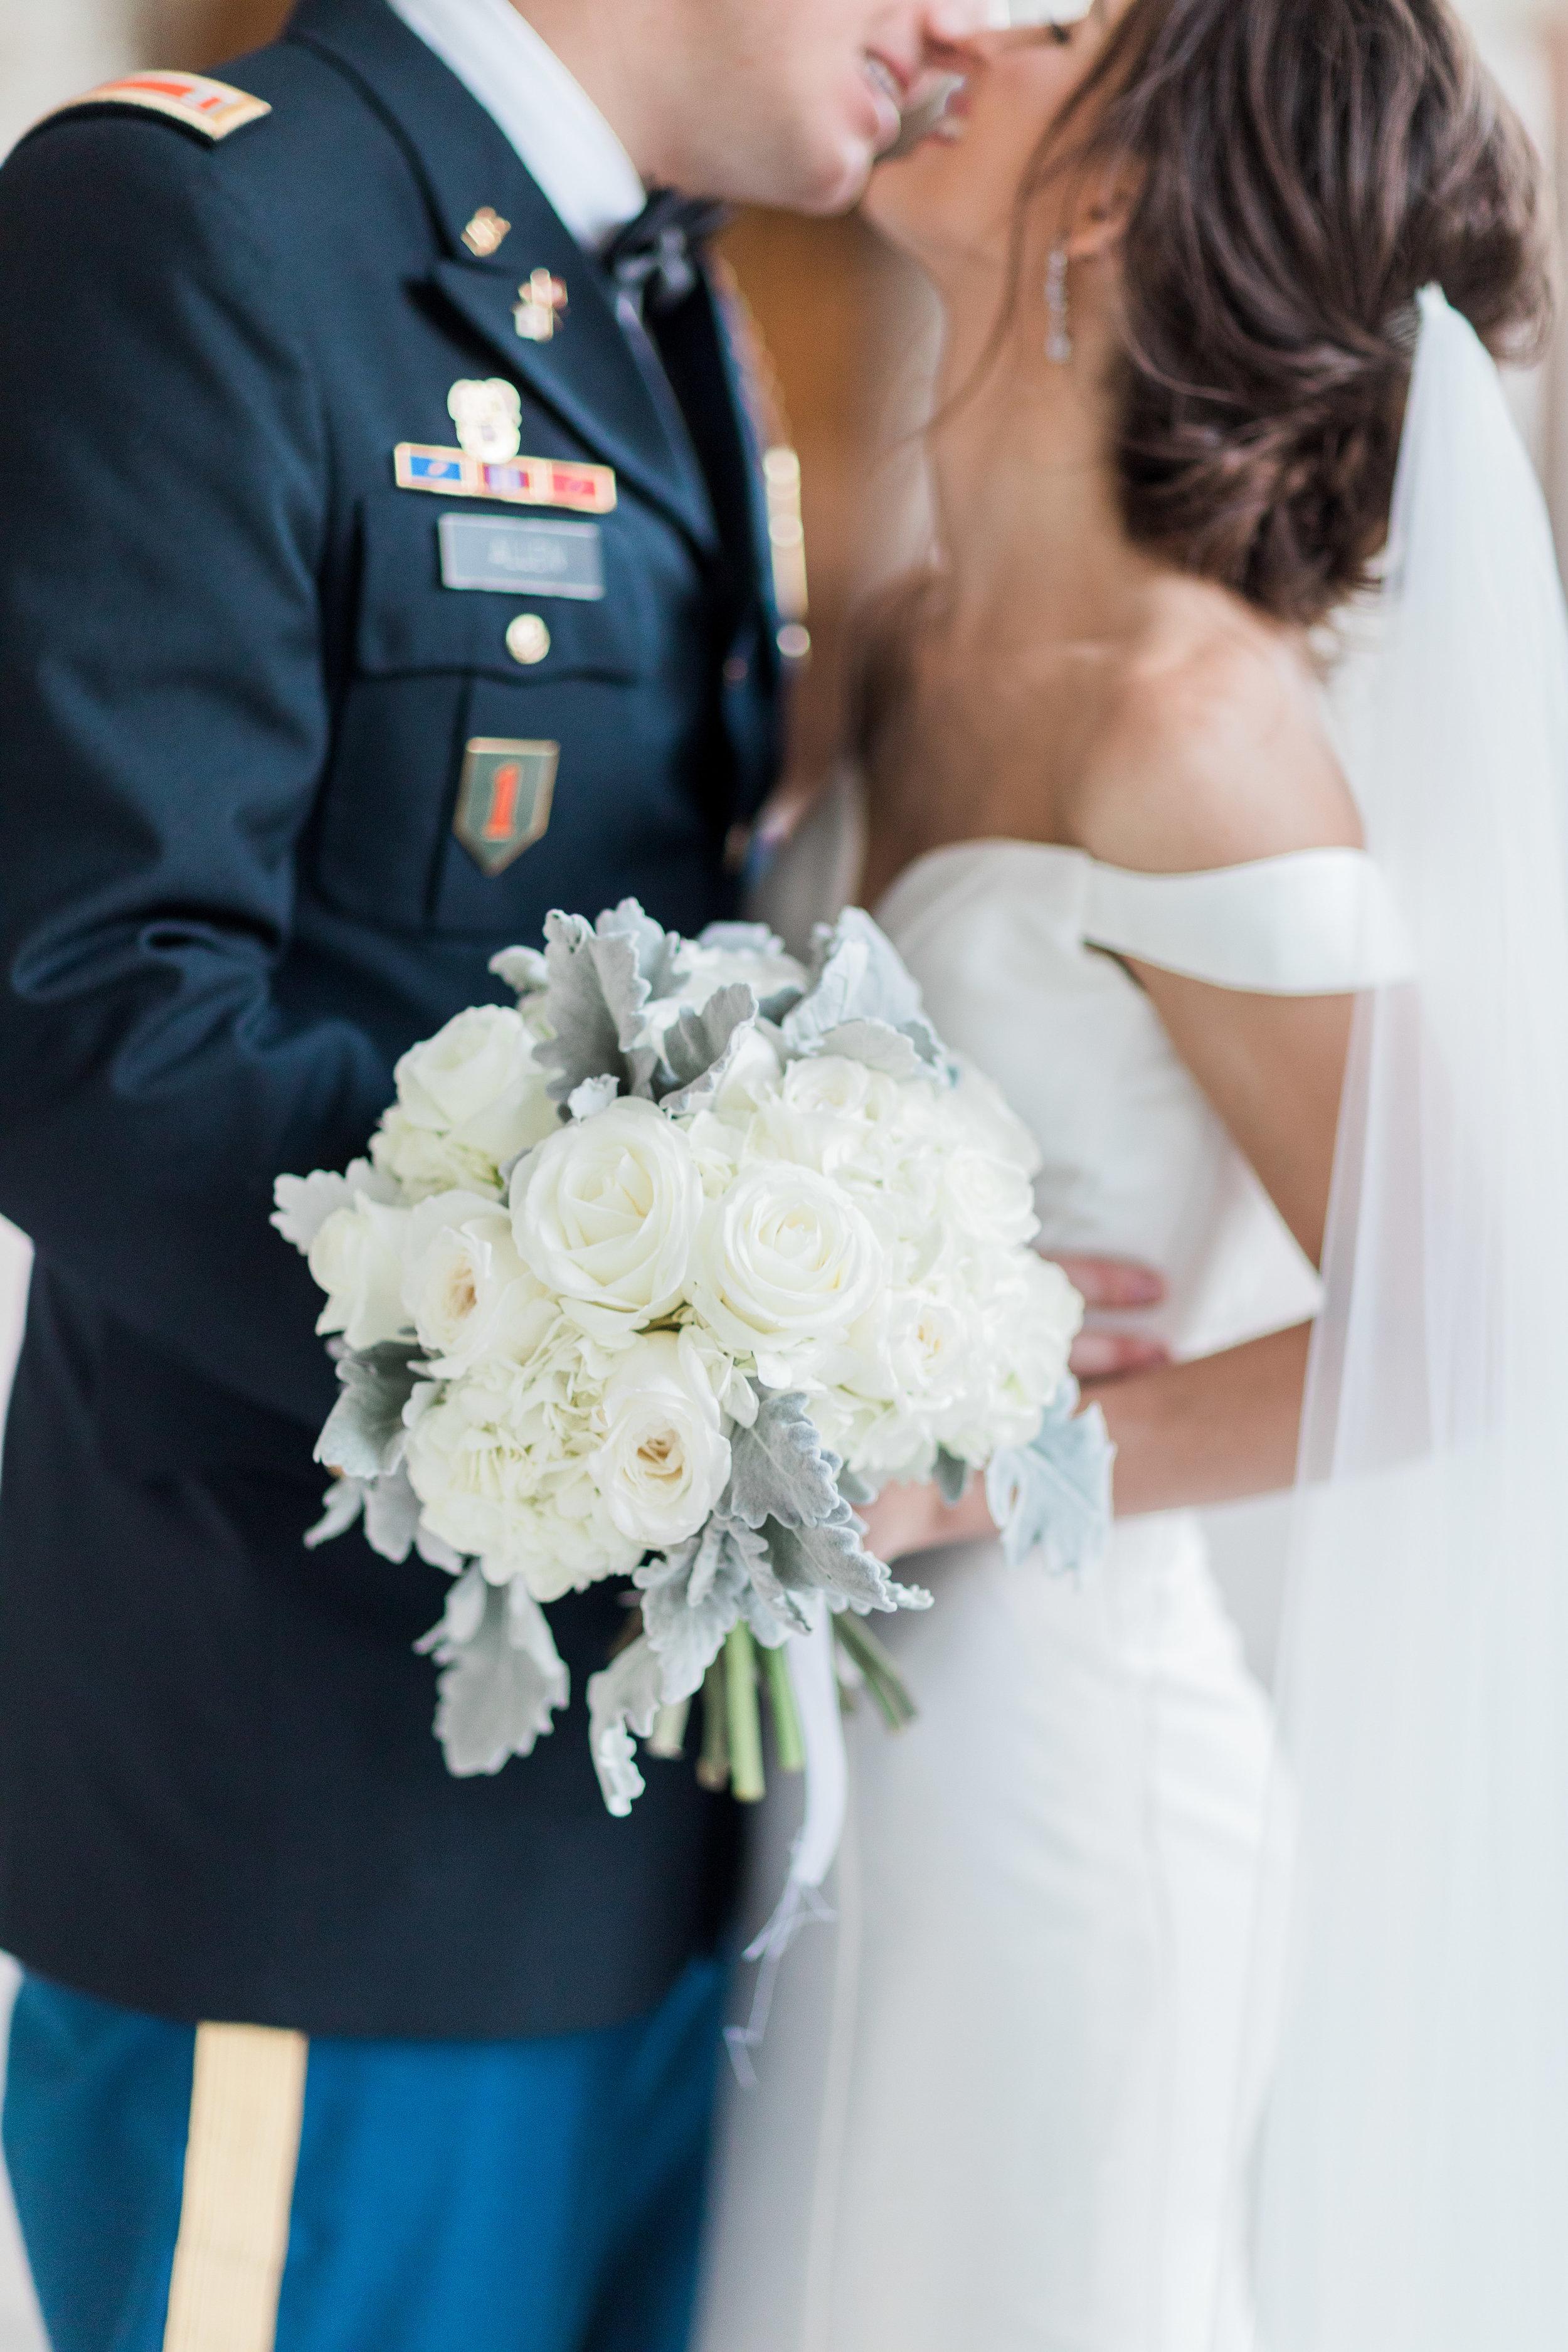 Taylor_TJ_St_Augustine_Treasury_on_the_Plaza_Wedding_Photography__0041_-41.jpg